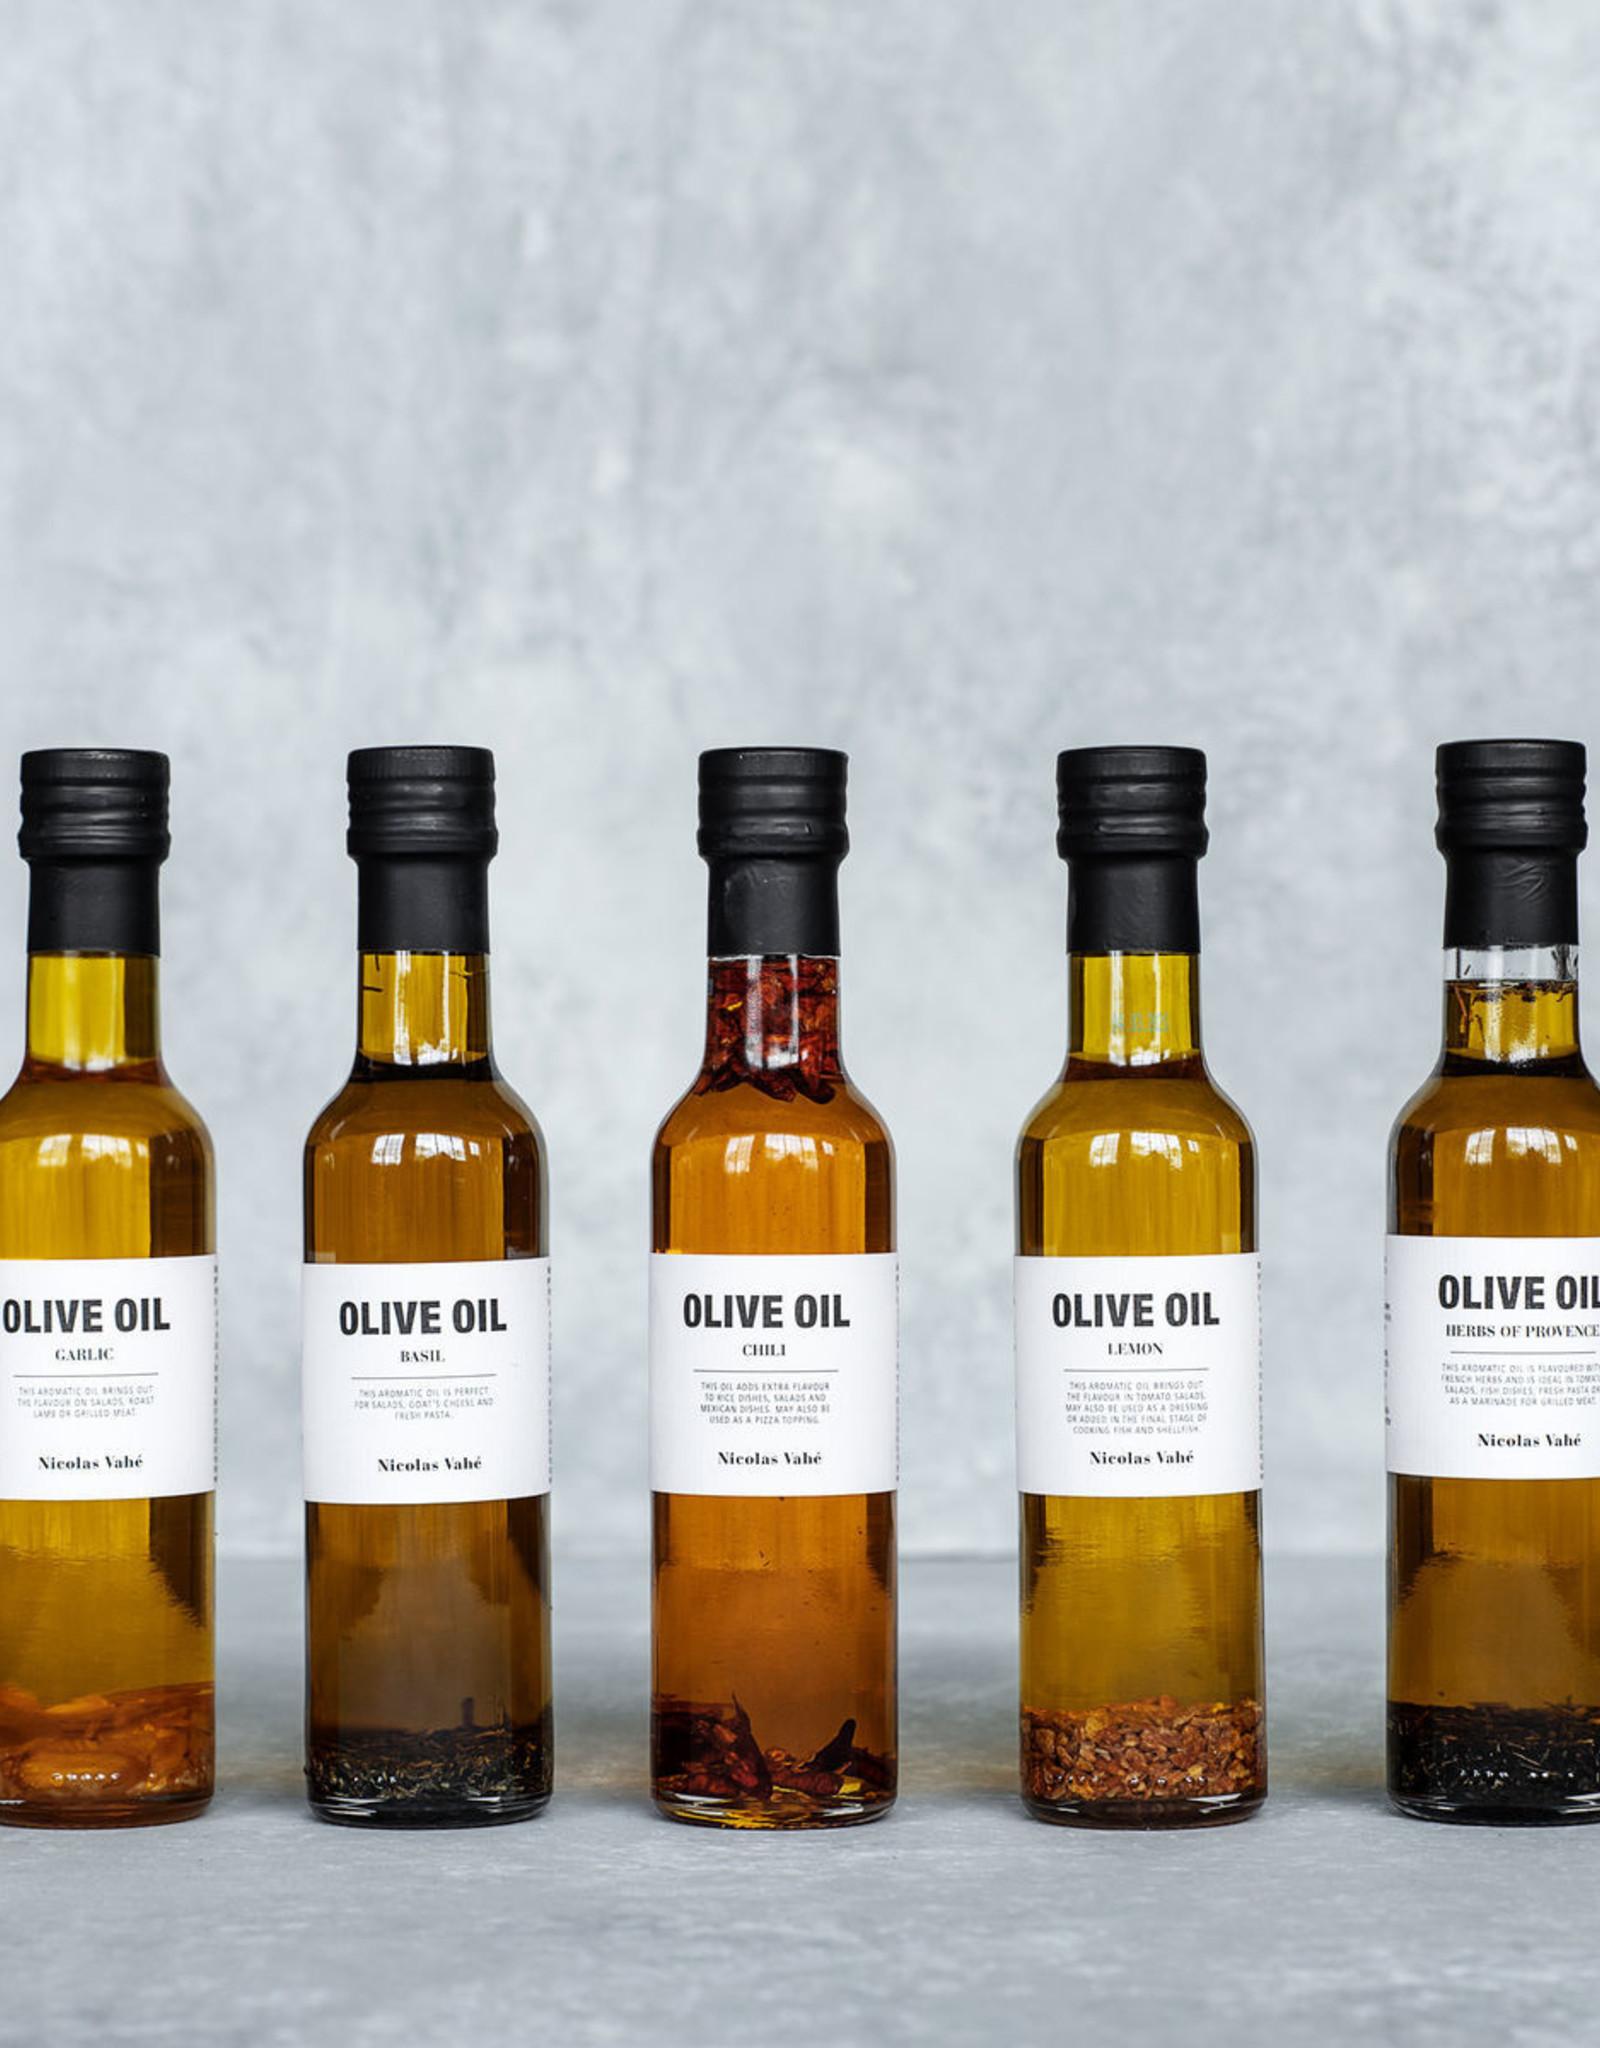 Nicolas Vahé Nicolas Vahé Olive Oil Chili